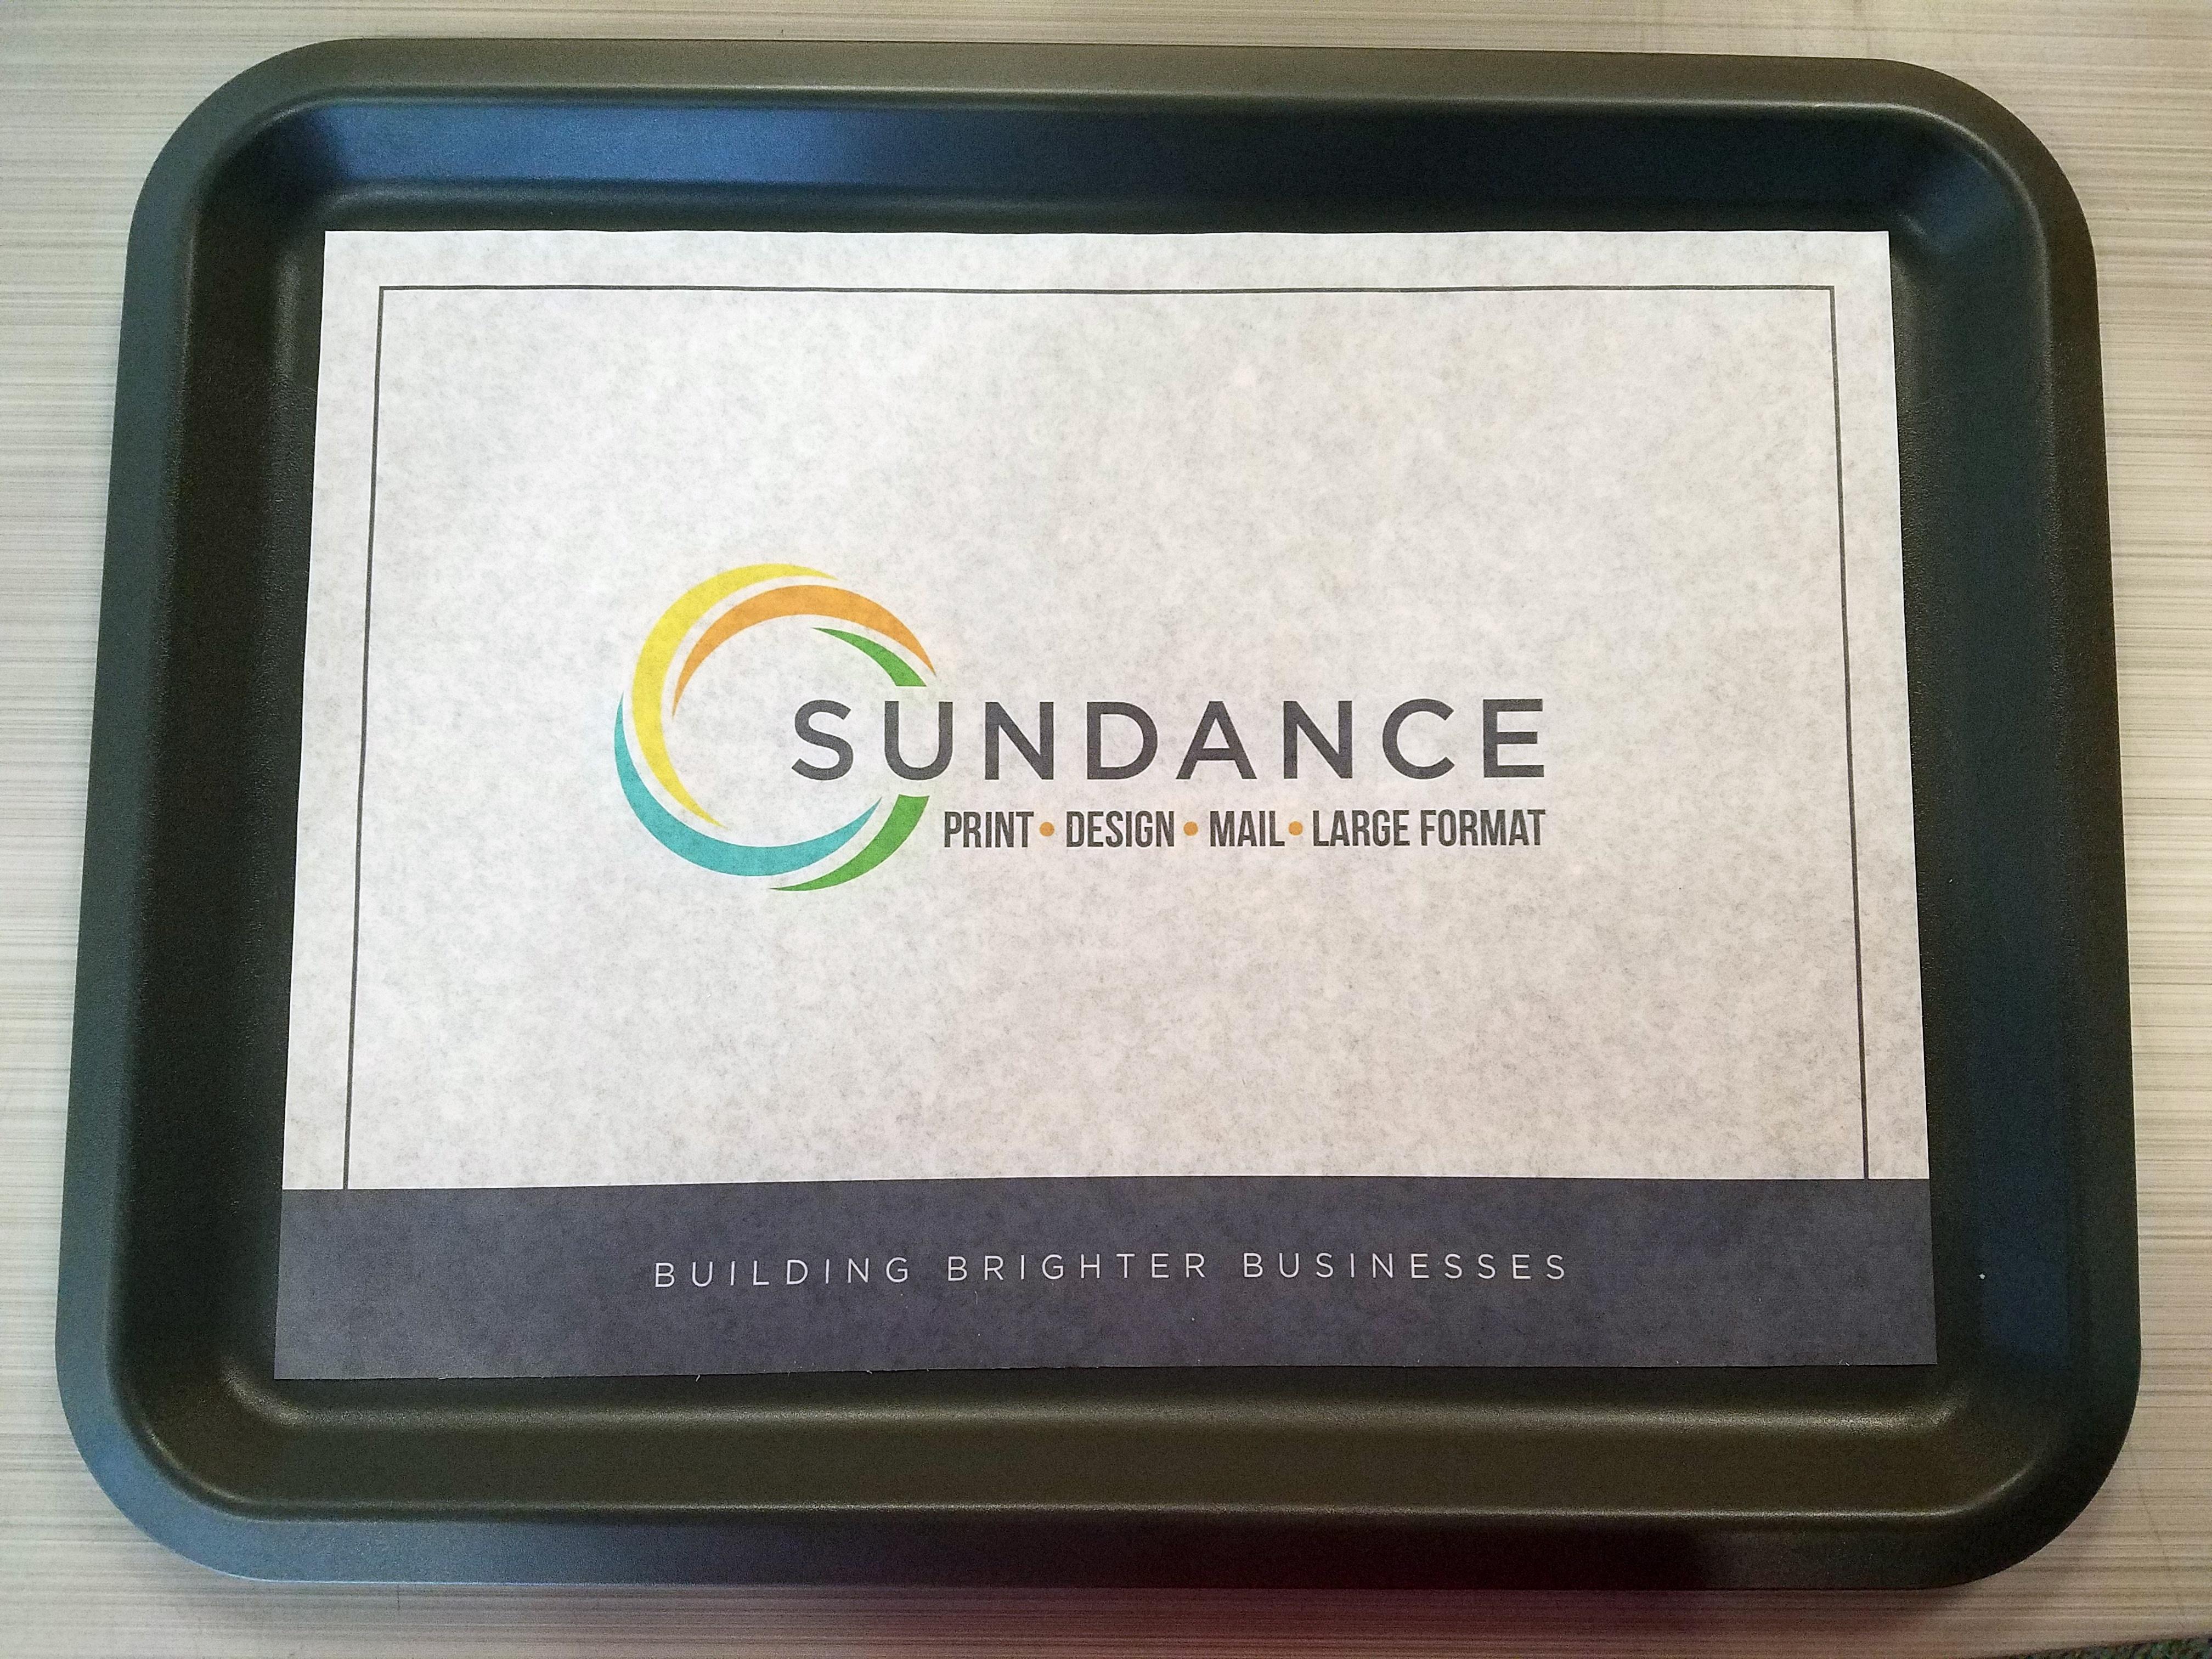 SunDance Makes FDA Printing Easy